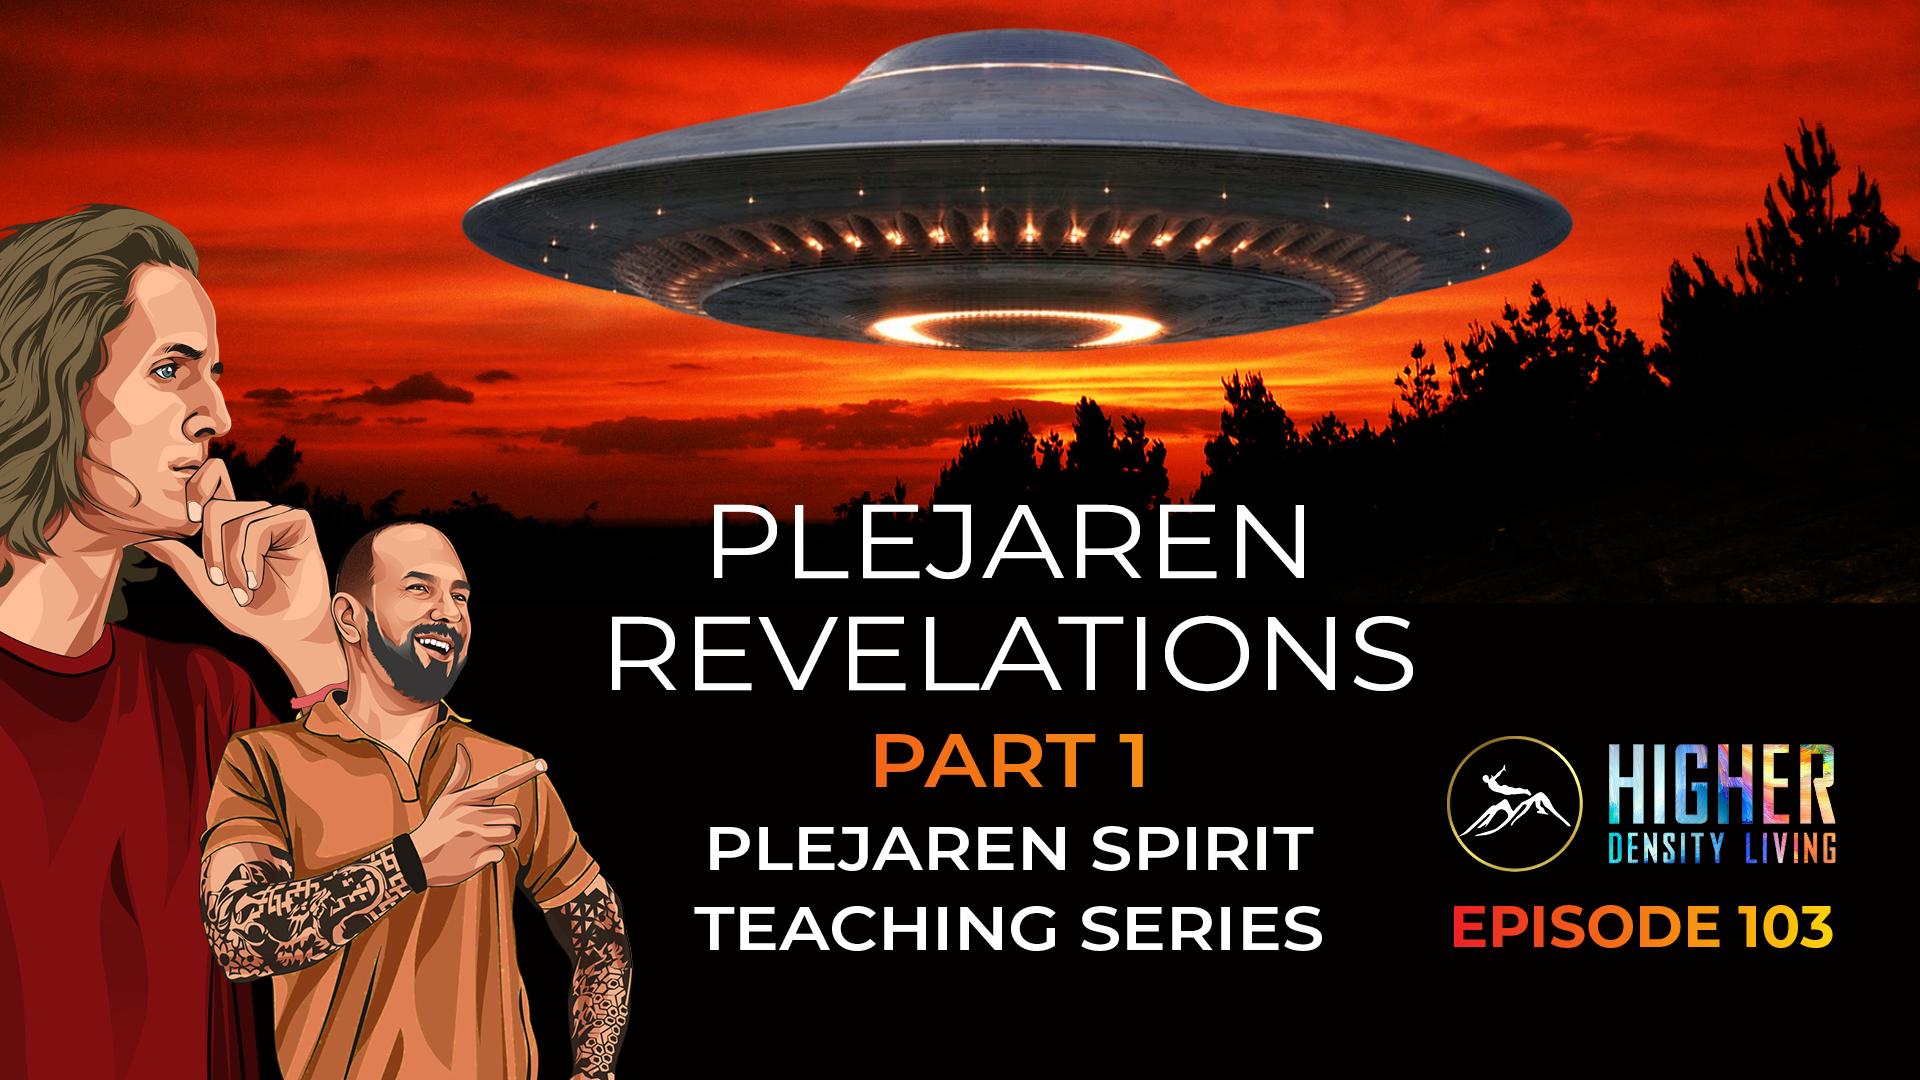 Plejaren Revelations Part 1 - Plejaren Spirit Teaching Series